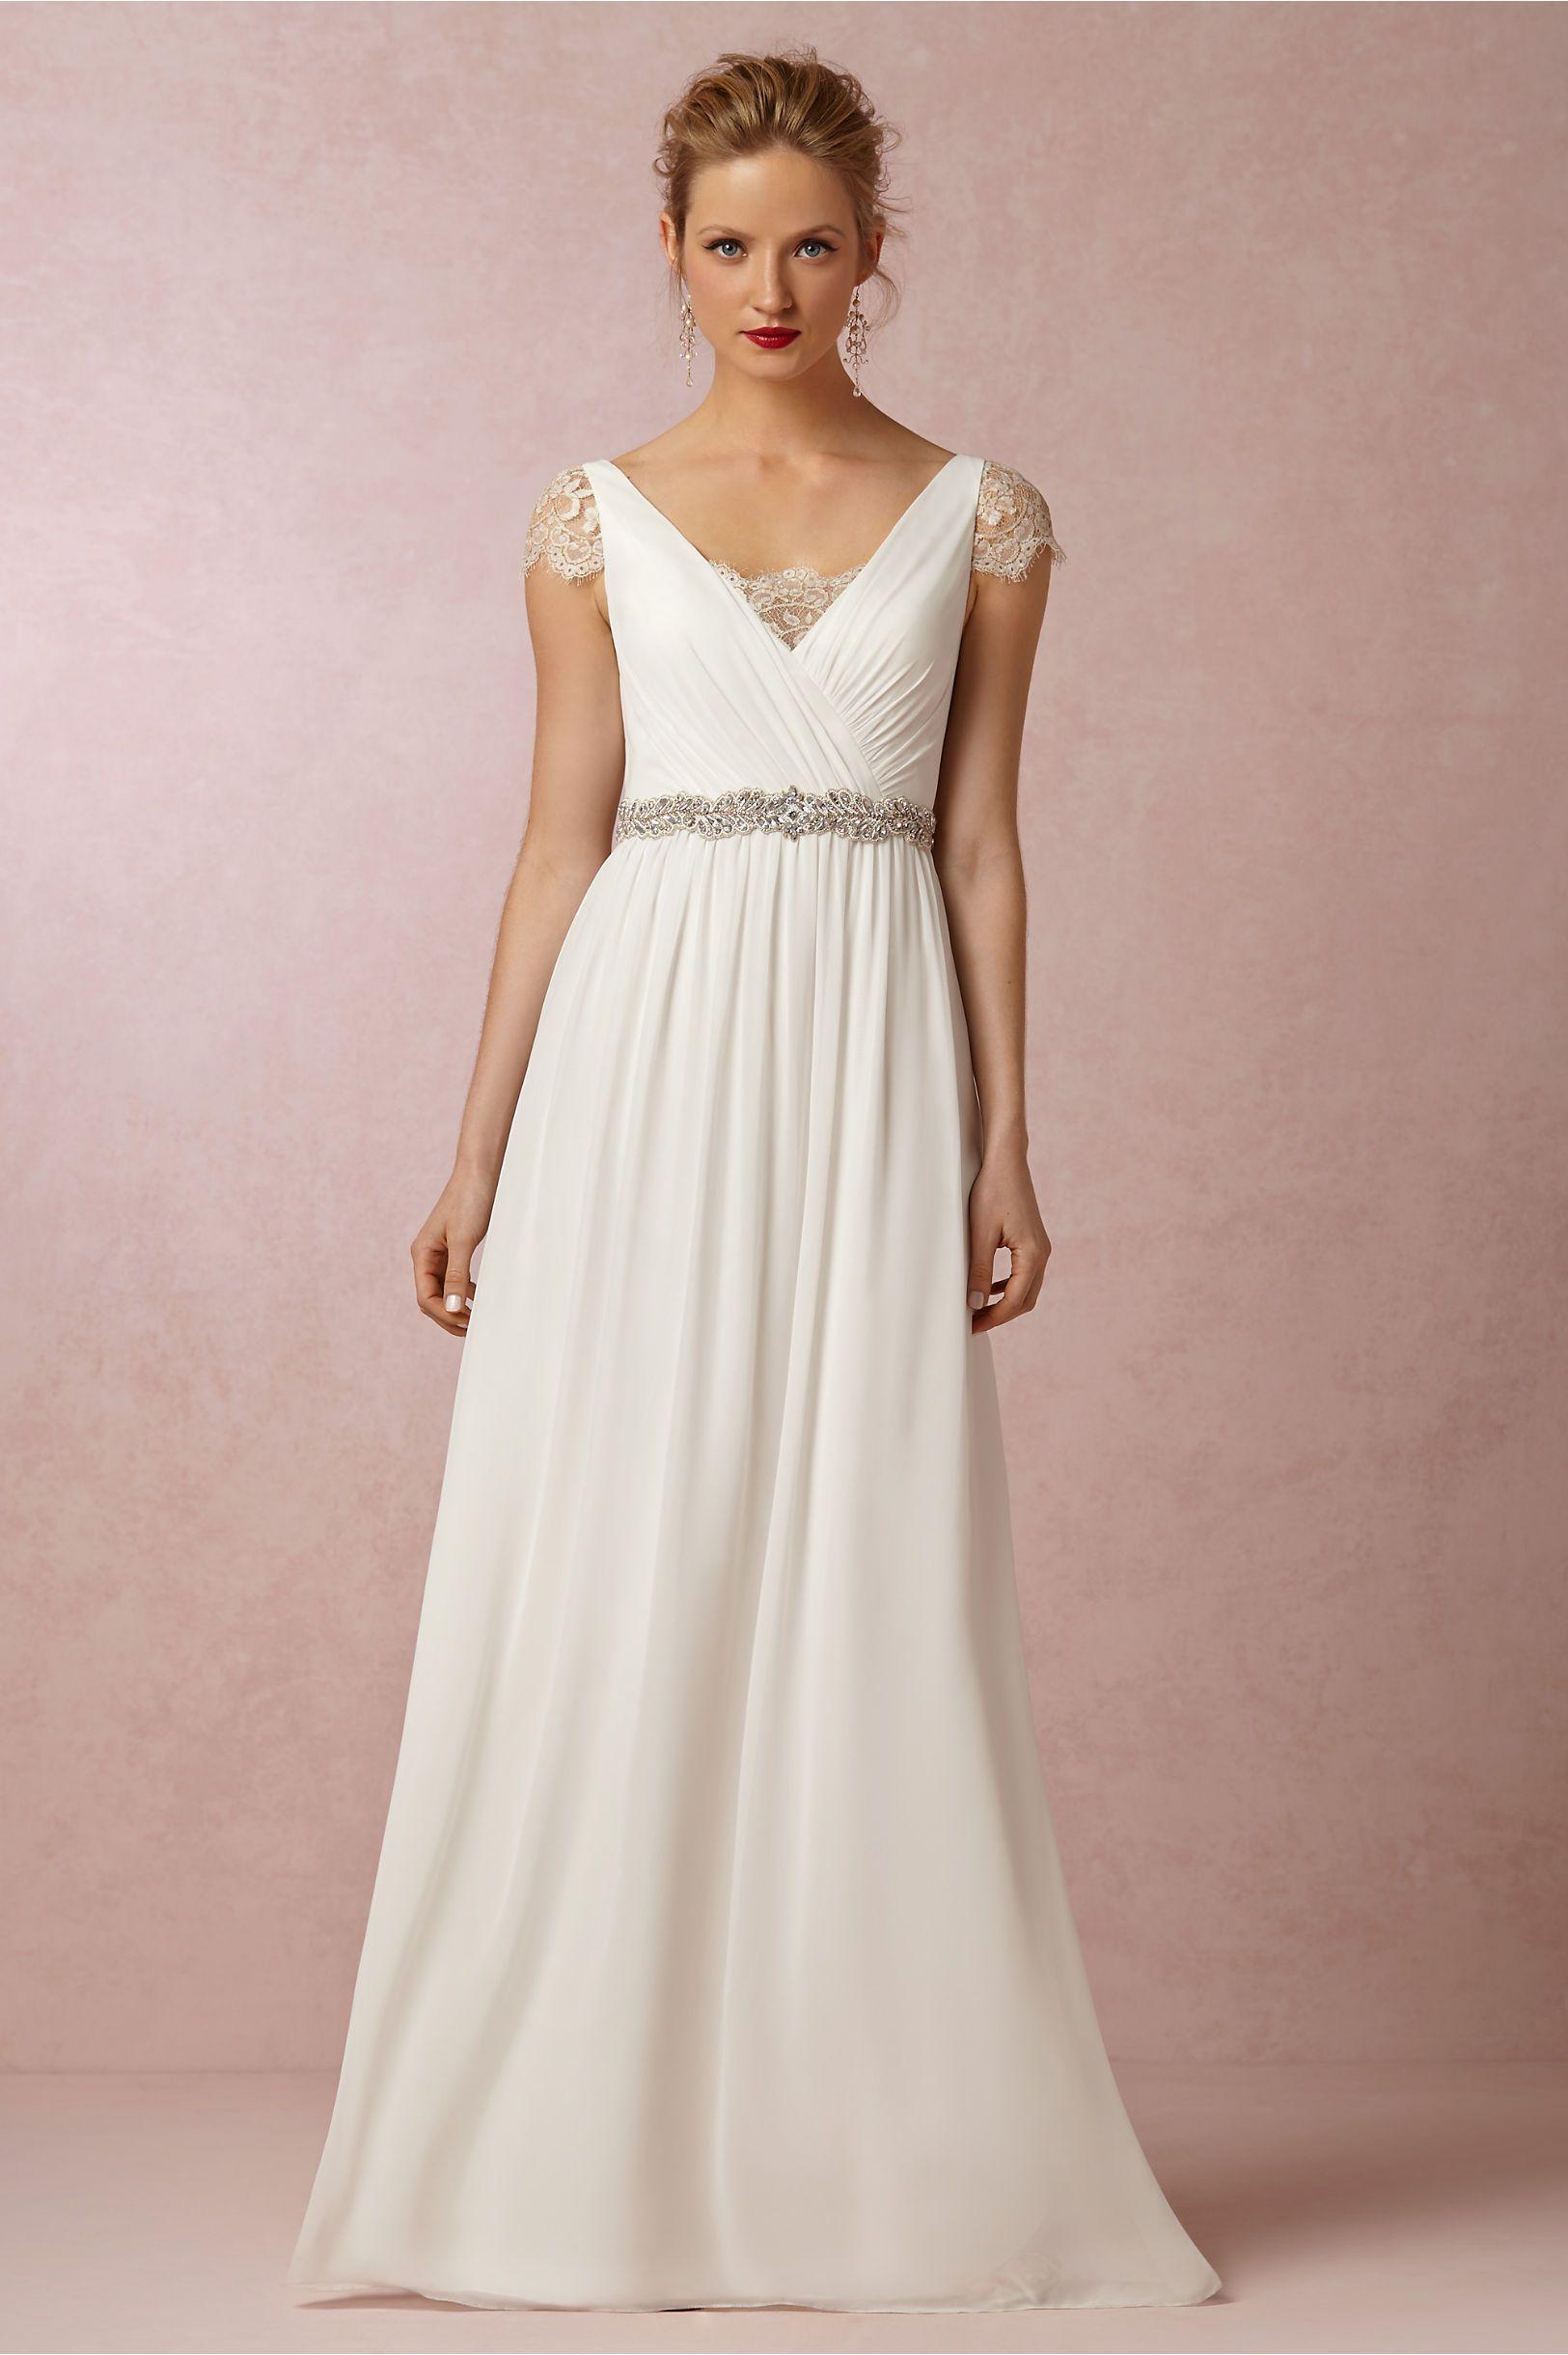 1500 wedding dress budget